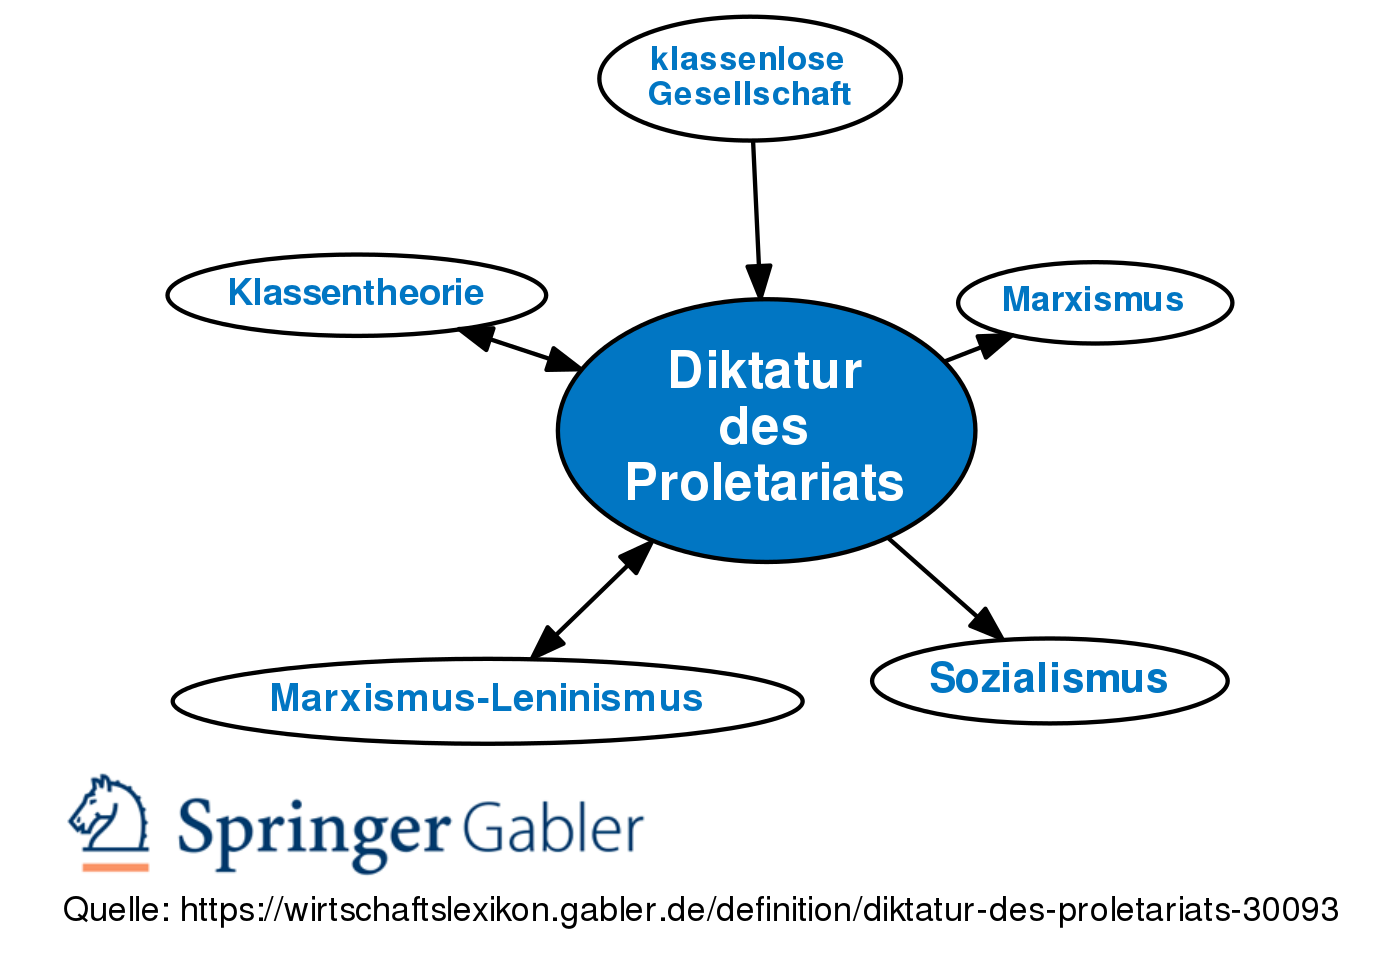 Diktatur des Proletariats • Definition | Gabler